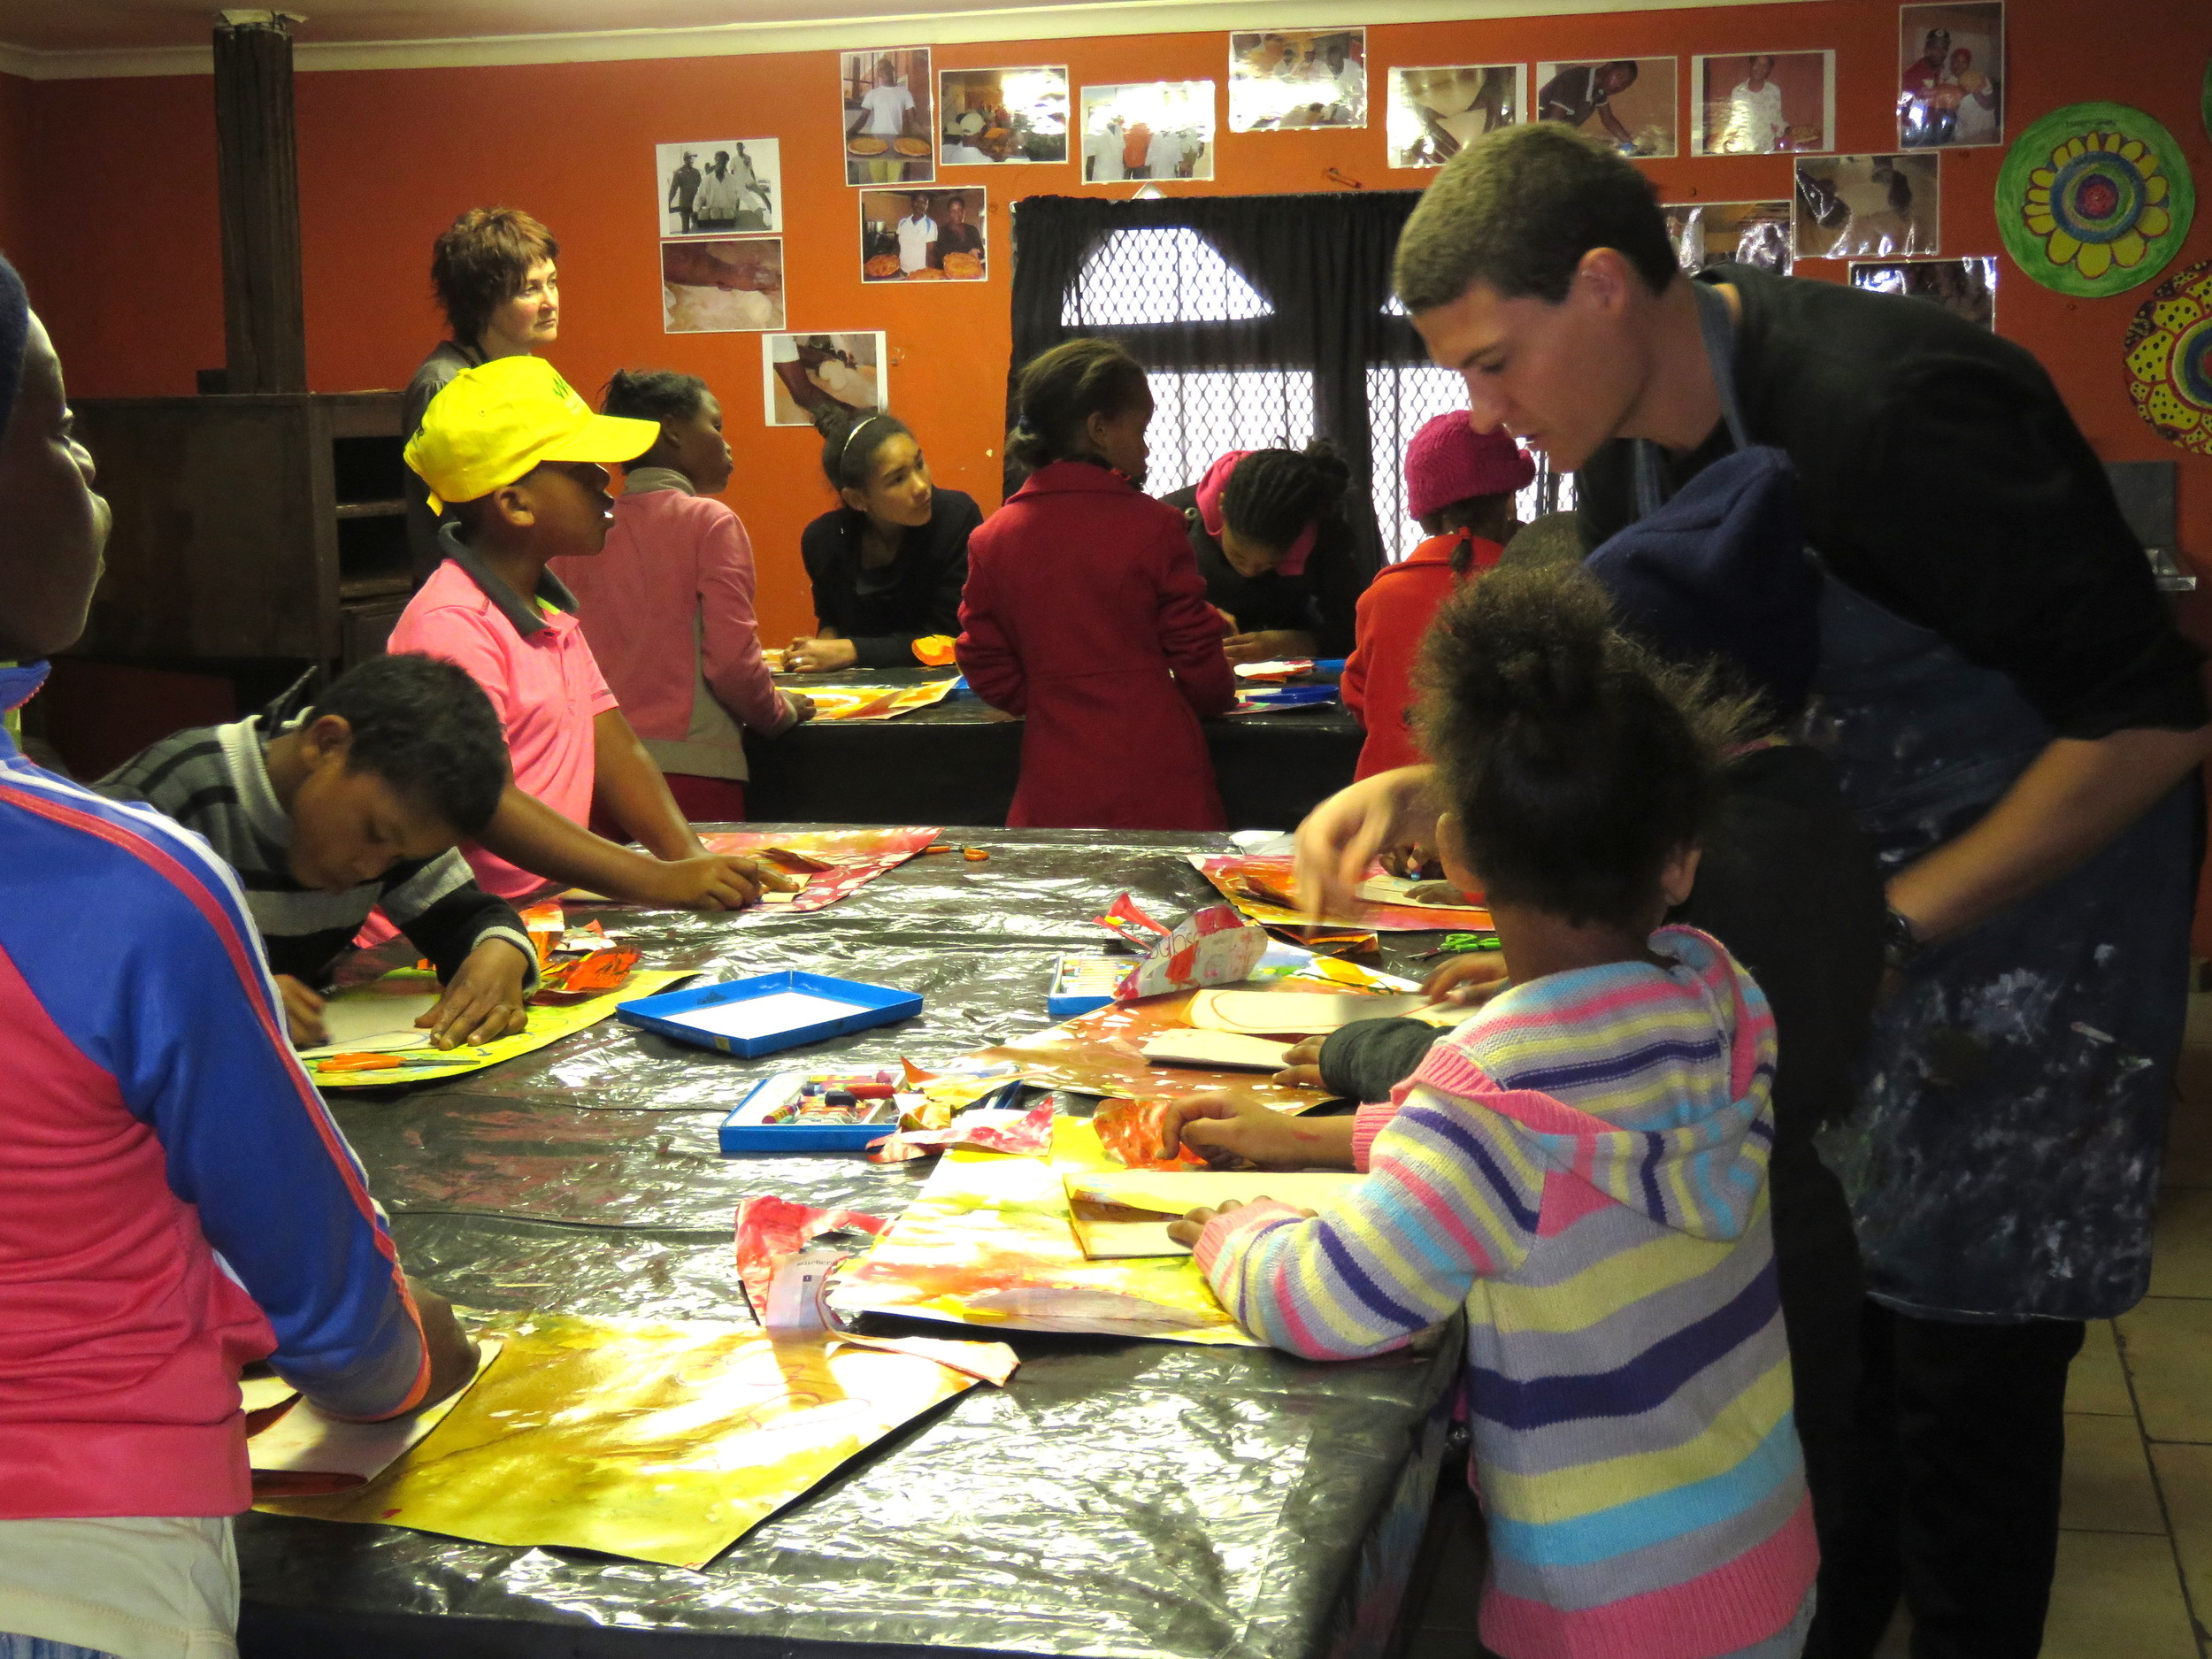 ARH, TAC & UNISA children's art partnership project in Delft